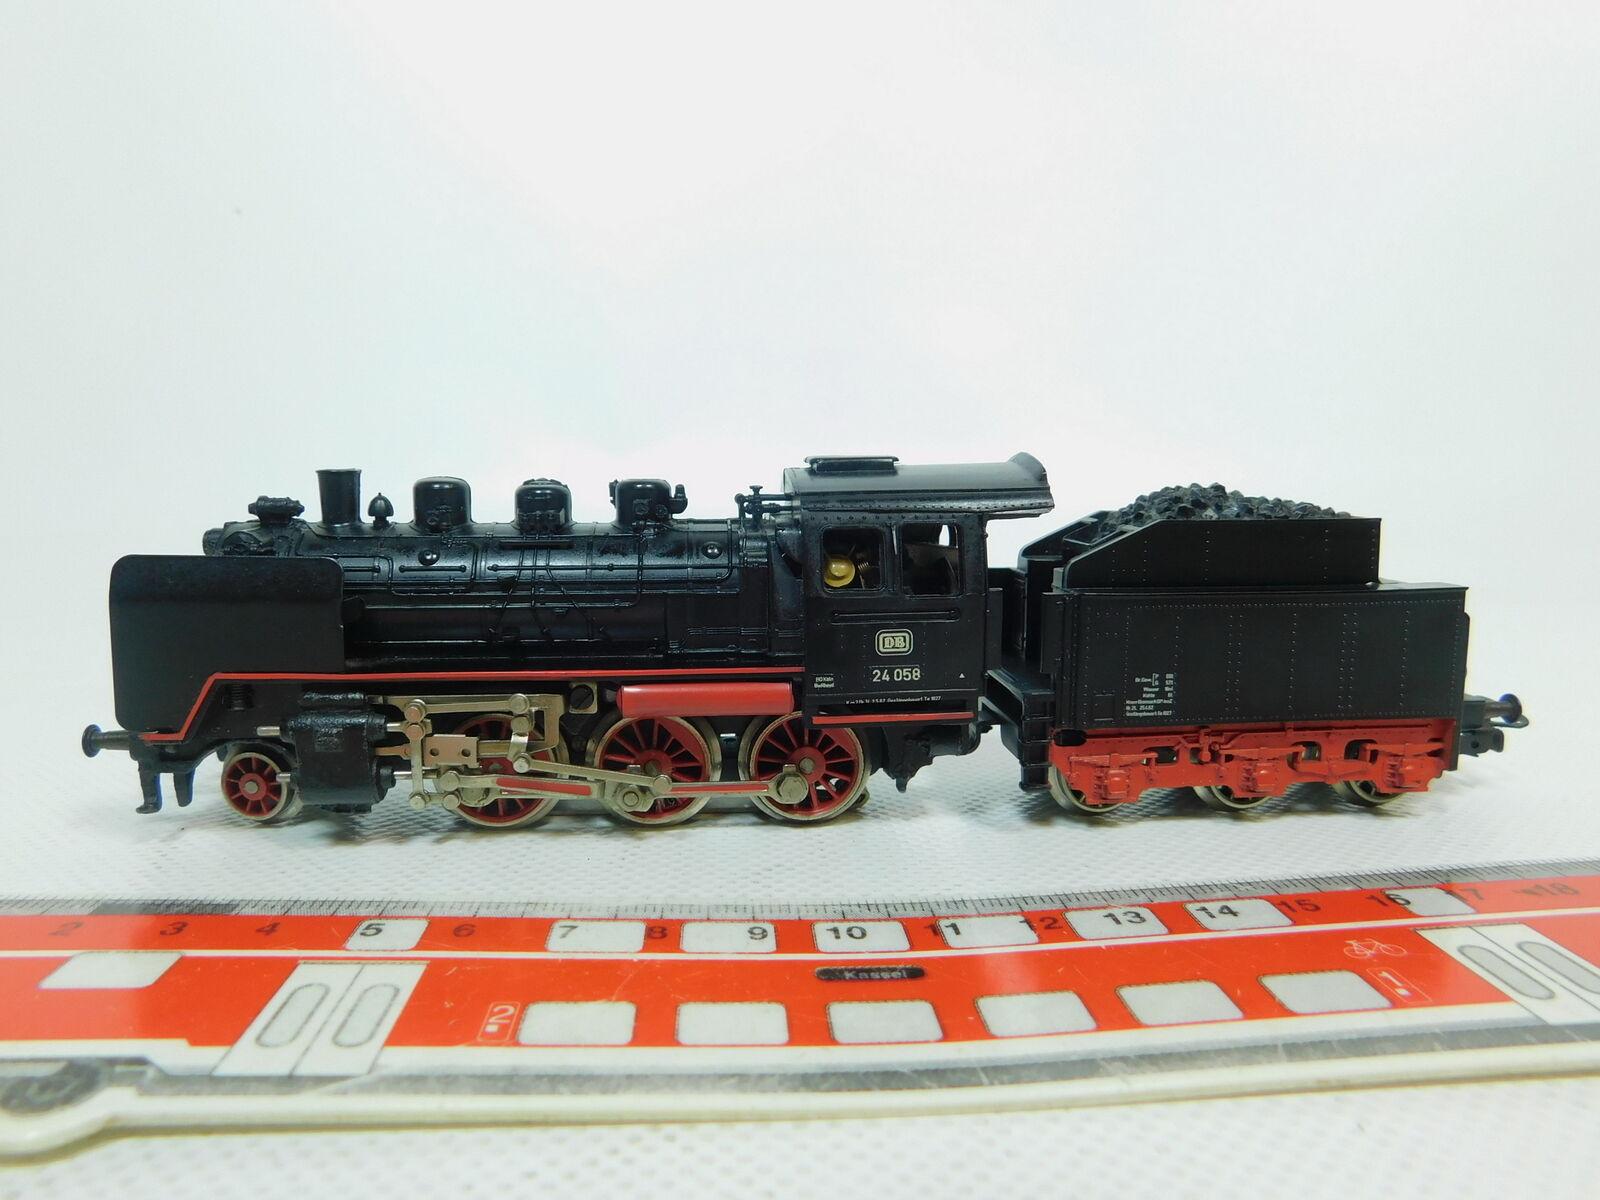 Bn298-1Märklin h0 ac 3003 Steam Locomotive Steam Locomotive 24 058 DB, Very Good